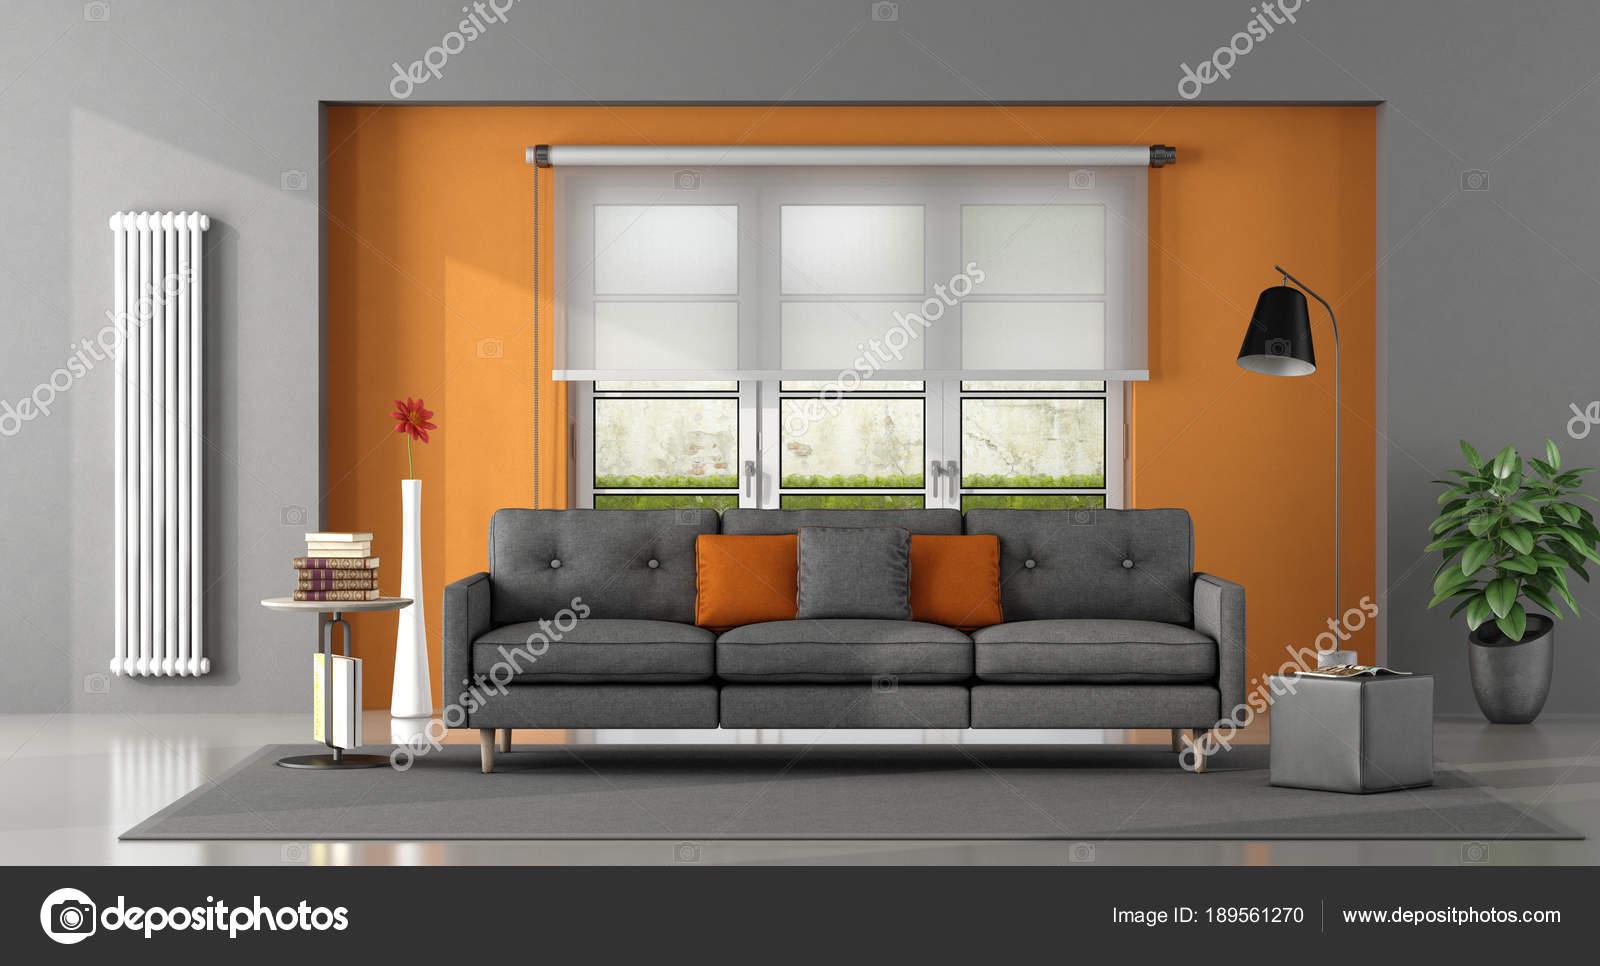 Salon gris y naranja  Saln naranja gris  Foto de stock